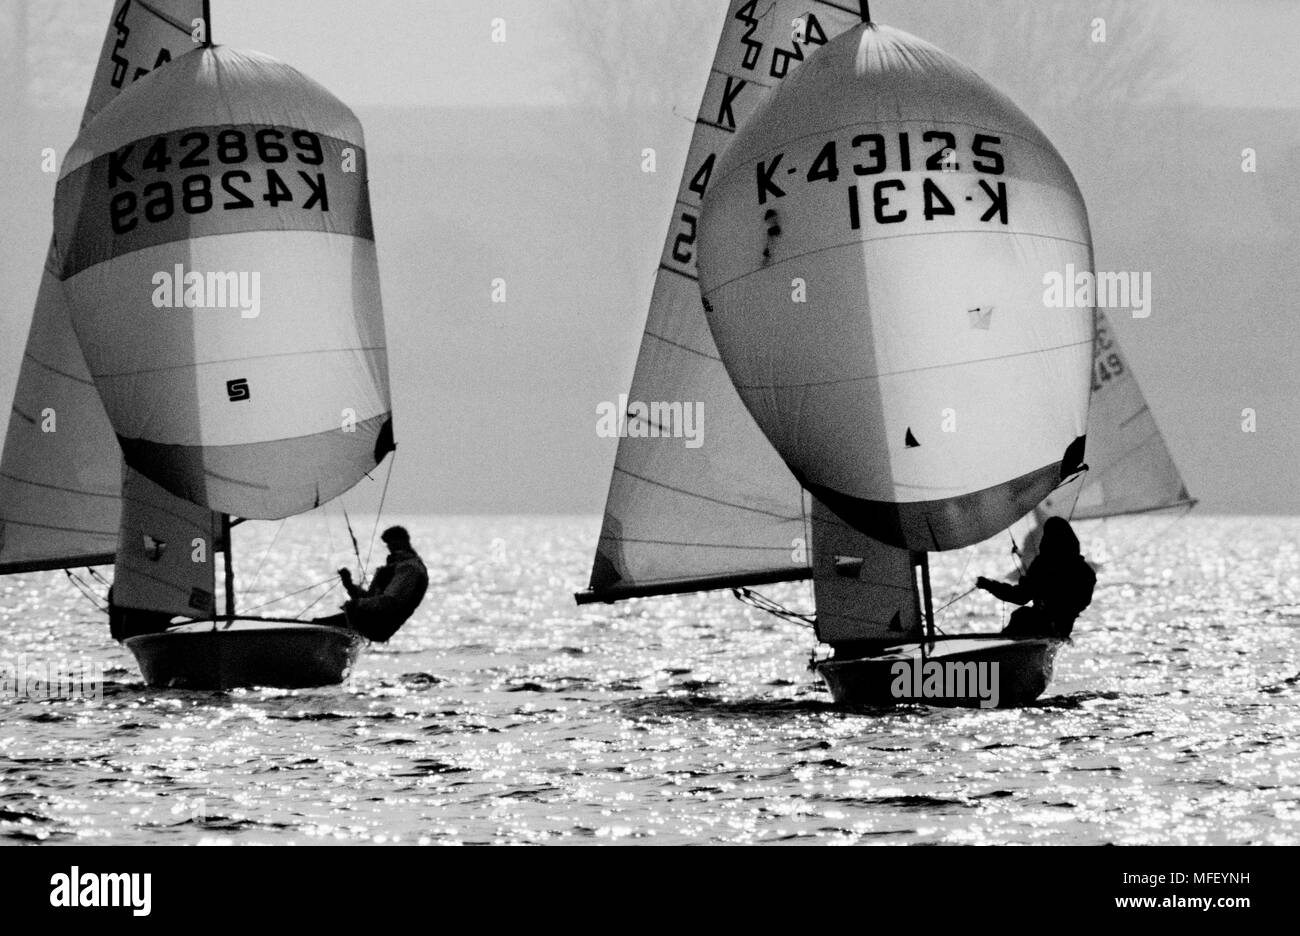 K420 sailing on Rutland Water, photographed for the Sunday Express Magazine. 1986 - Stock Image